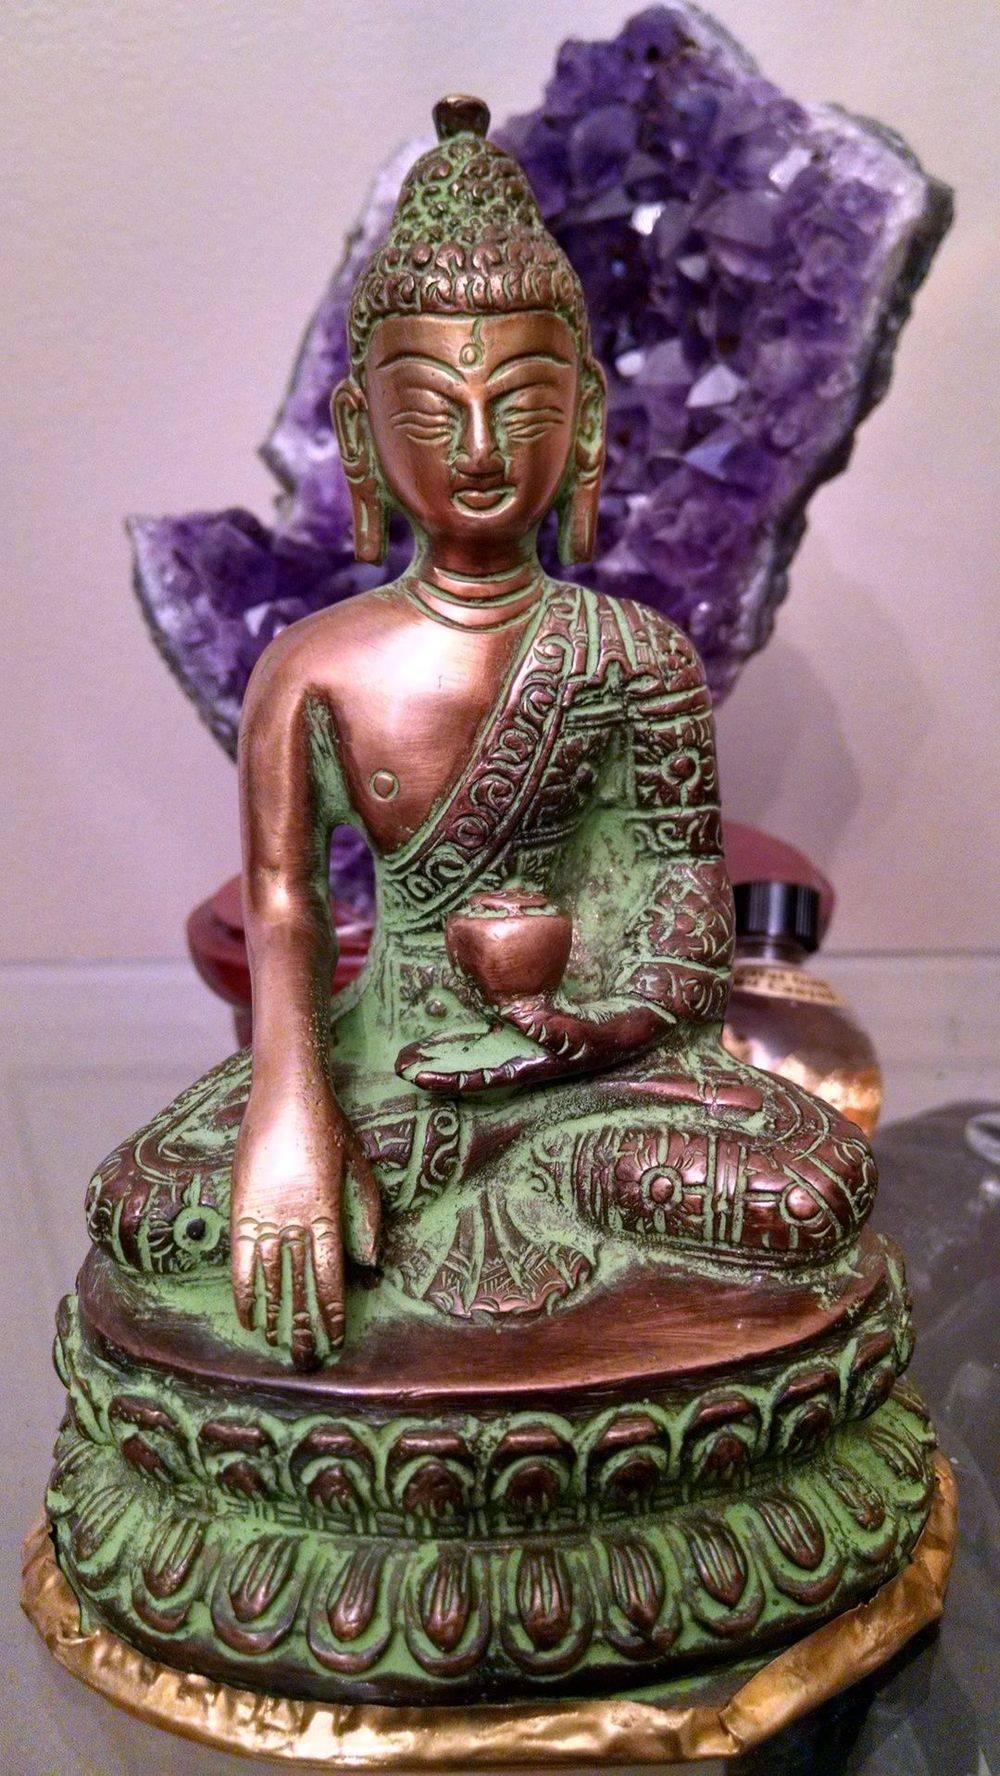 Gautama Buddha, also known as Siddhārtha Gautama, Shakyamuni, or simply the Buddha